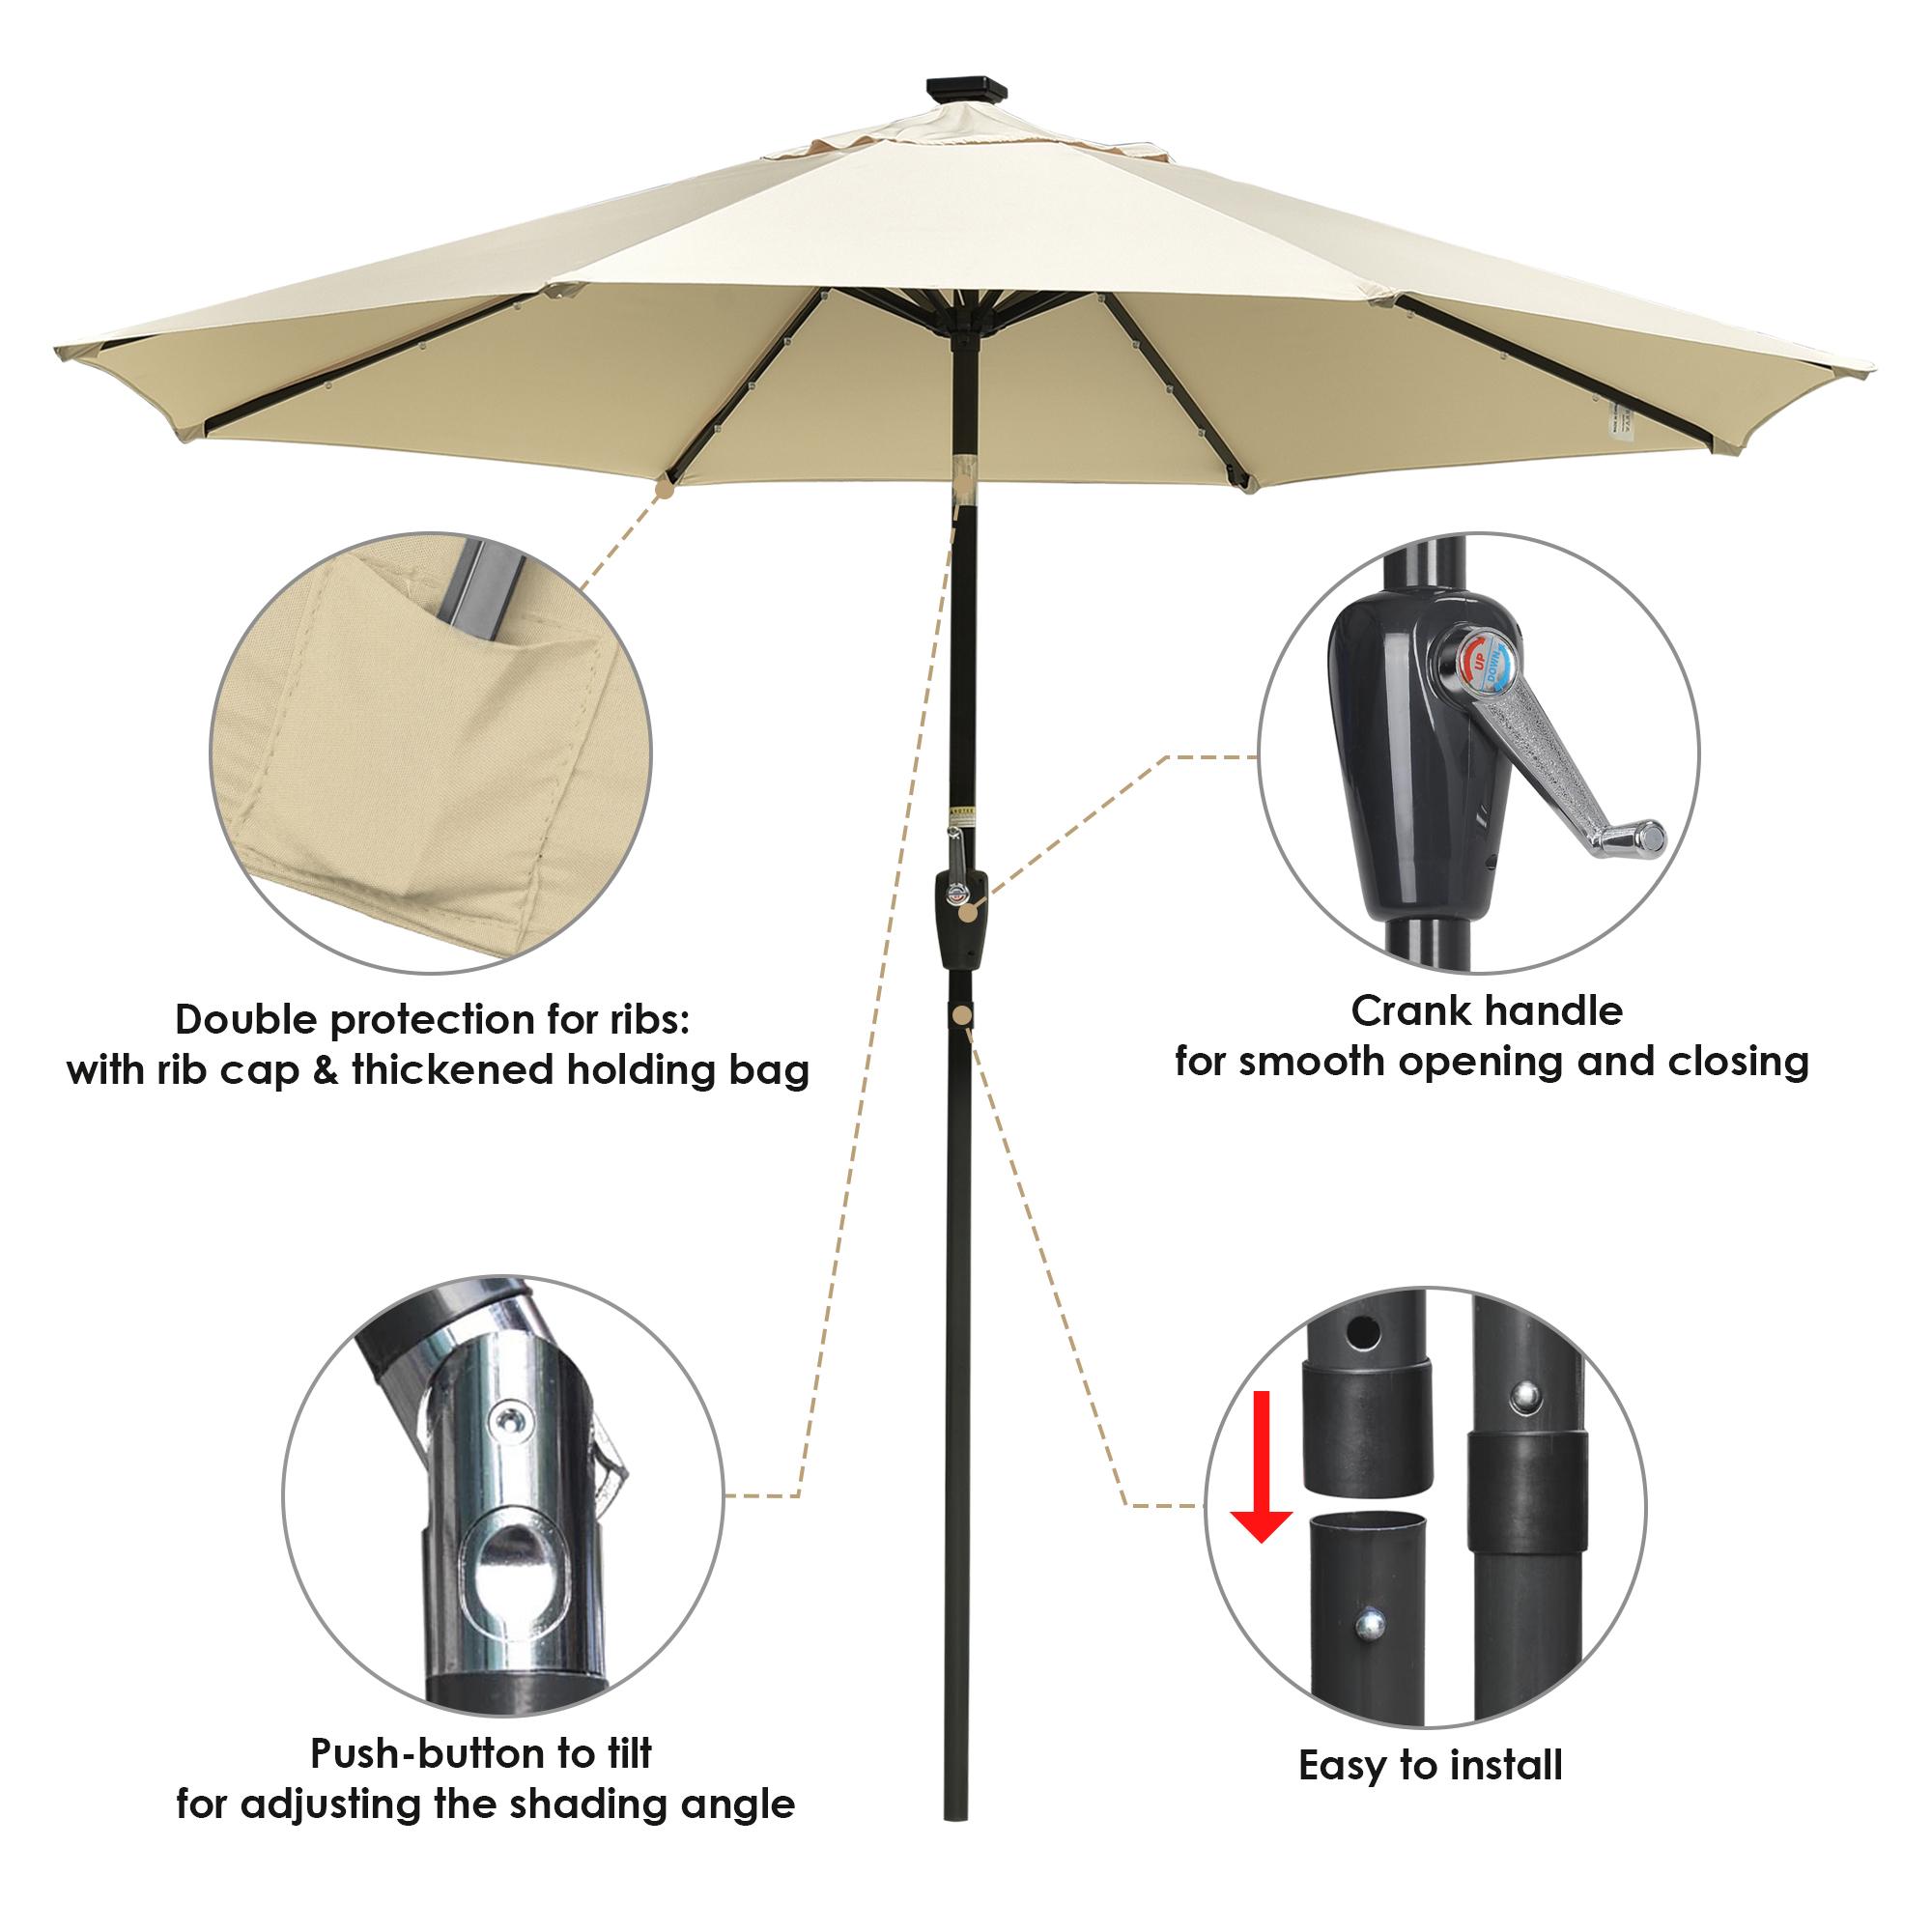 thumbnail 25 - 9' Patio Outdoor Umbrella Solar LED 8 Rib Garden Parasol Yard Deck Table Shade